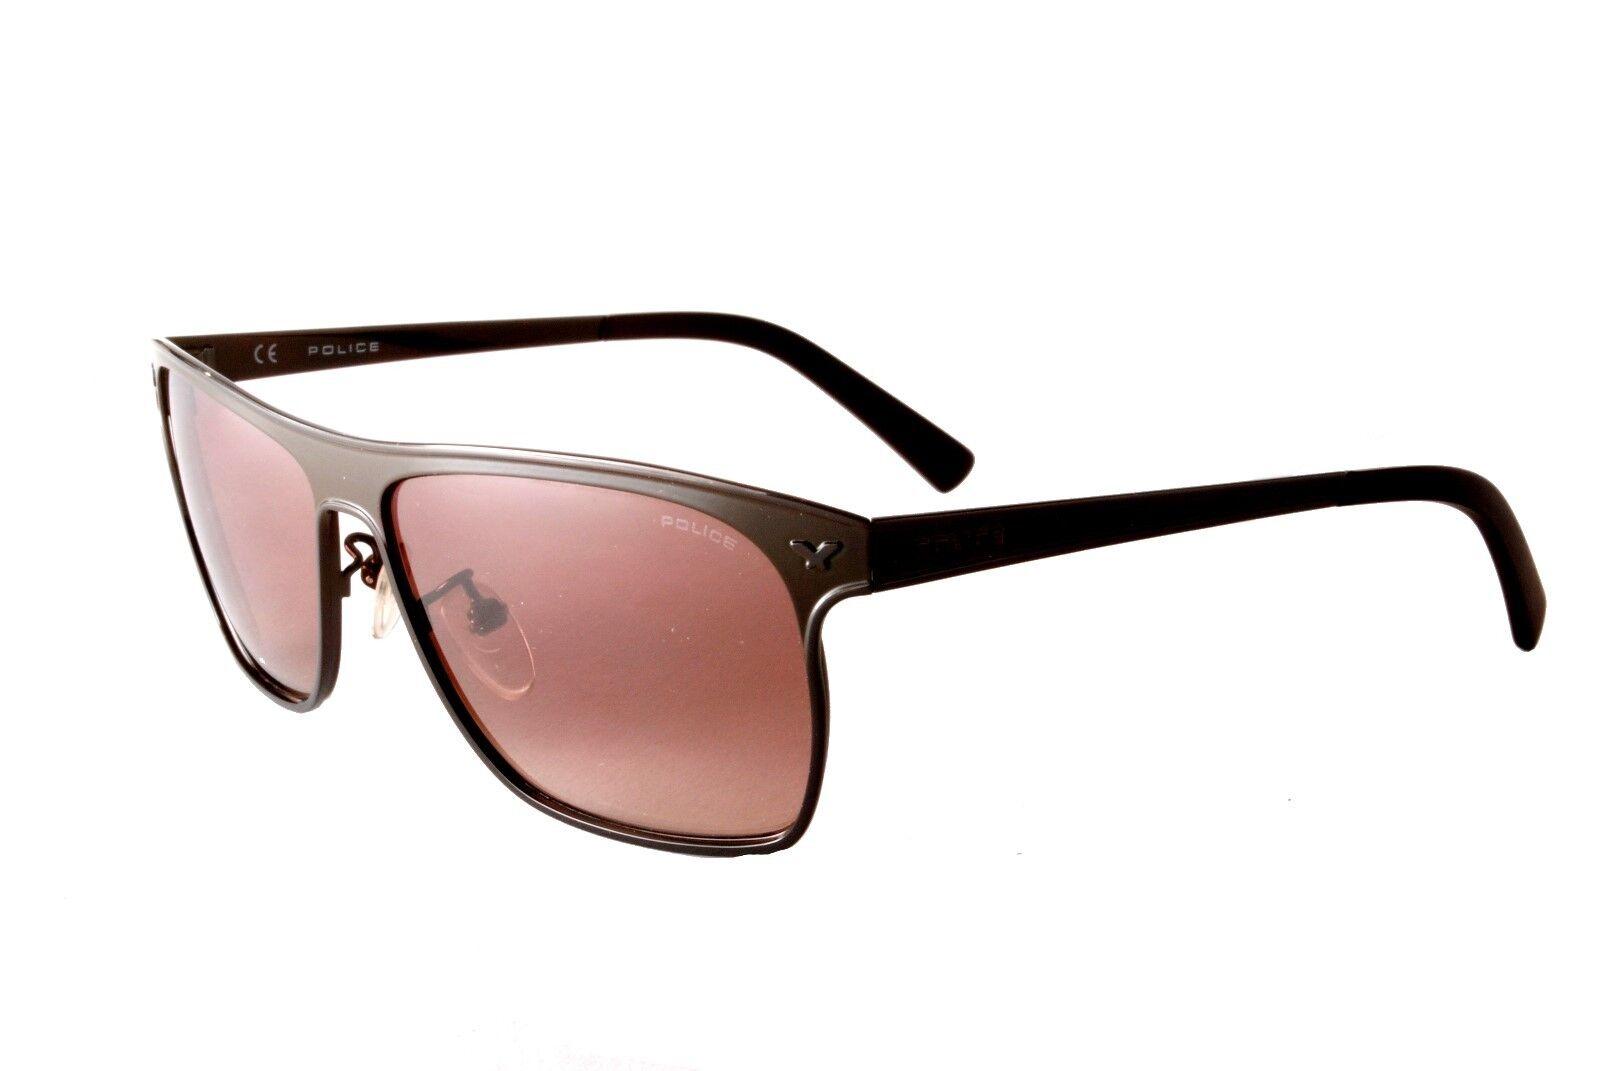 575cbc96374 Police Sunglasses History 1 S8948 596X Matt Brown Brown 883663718334 ...